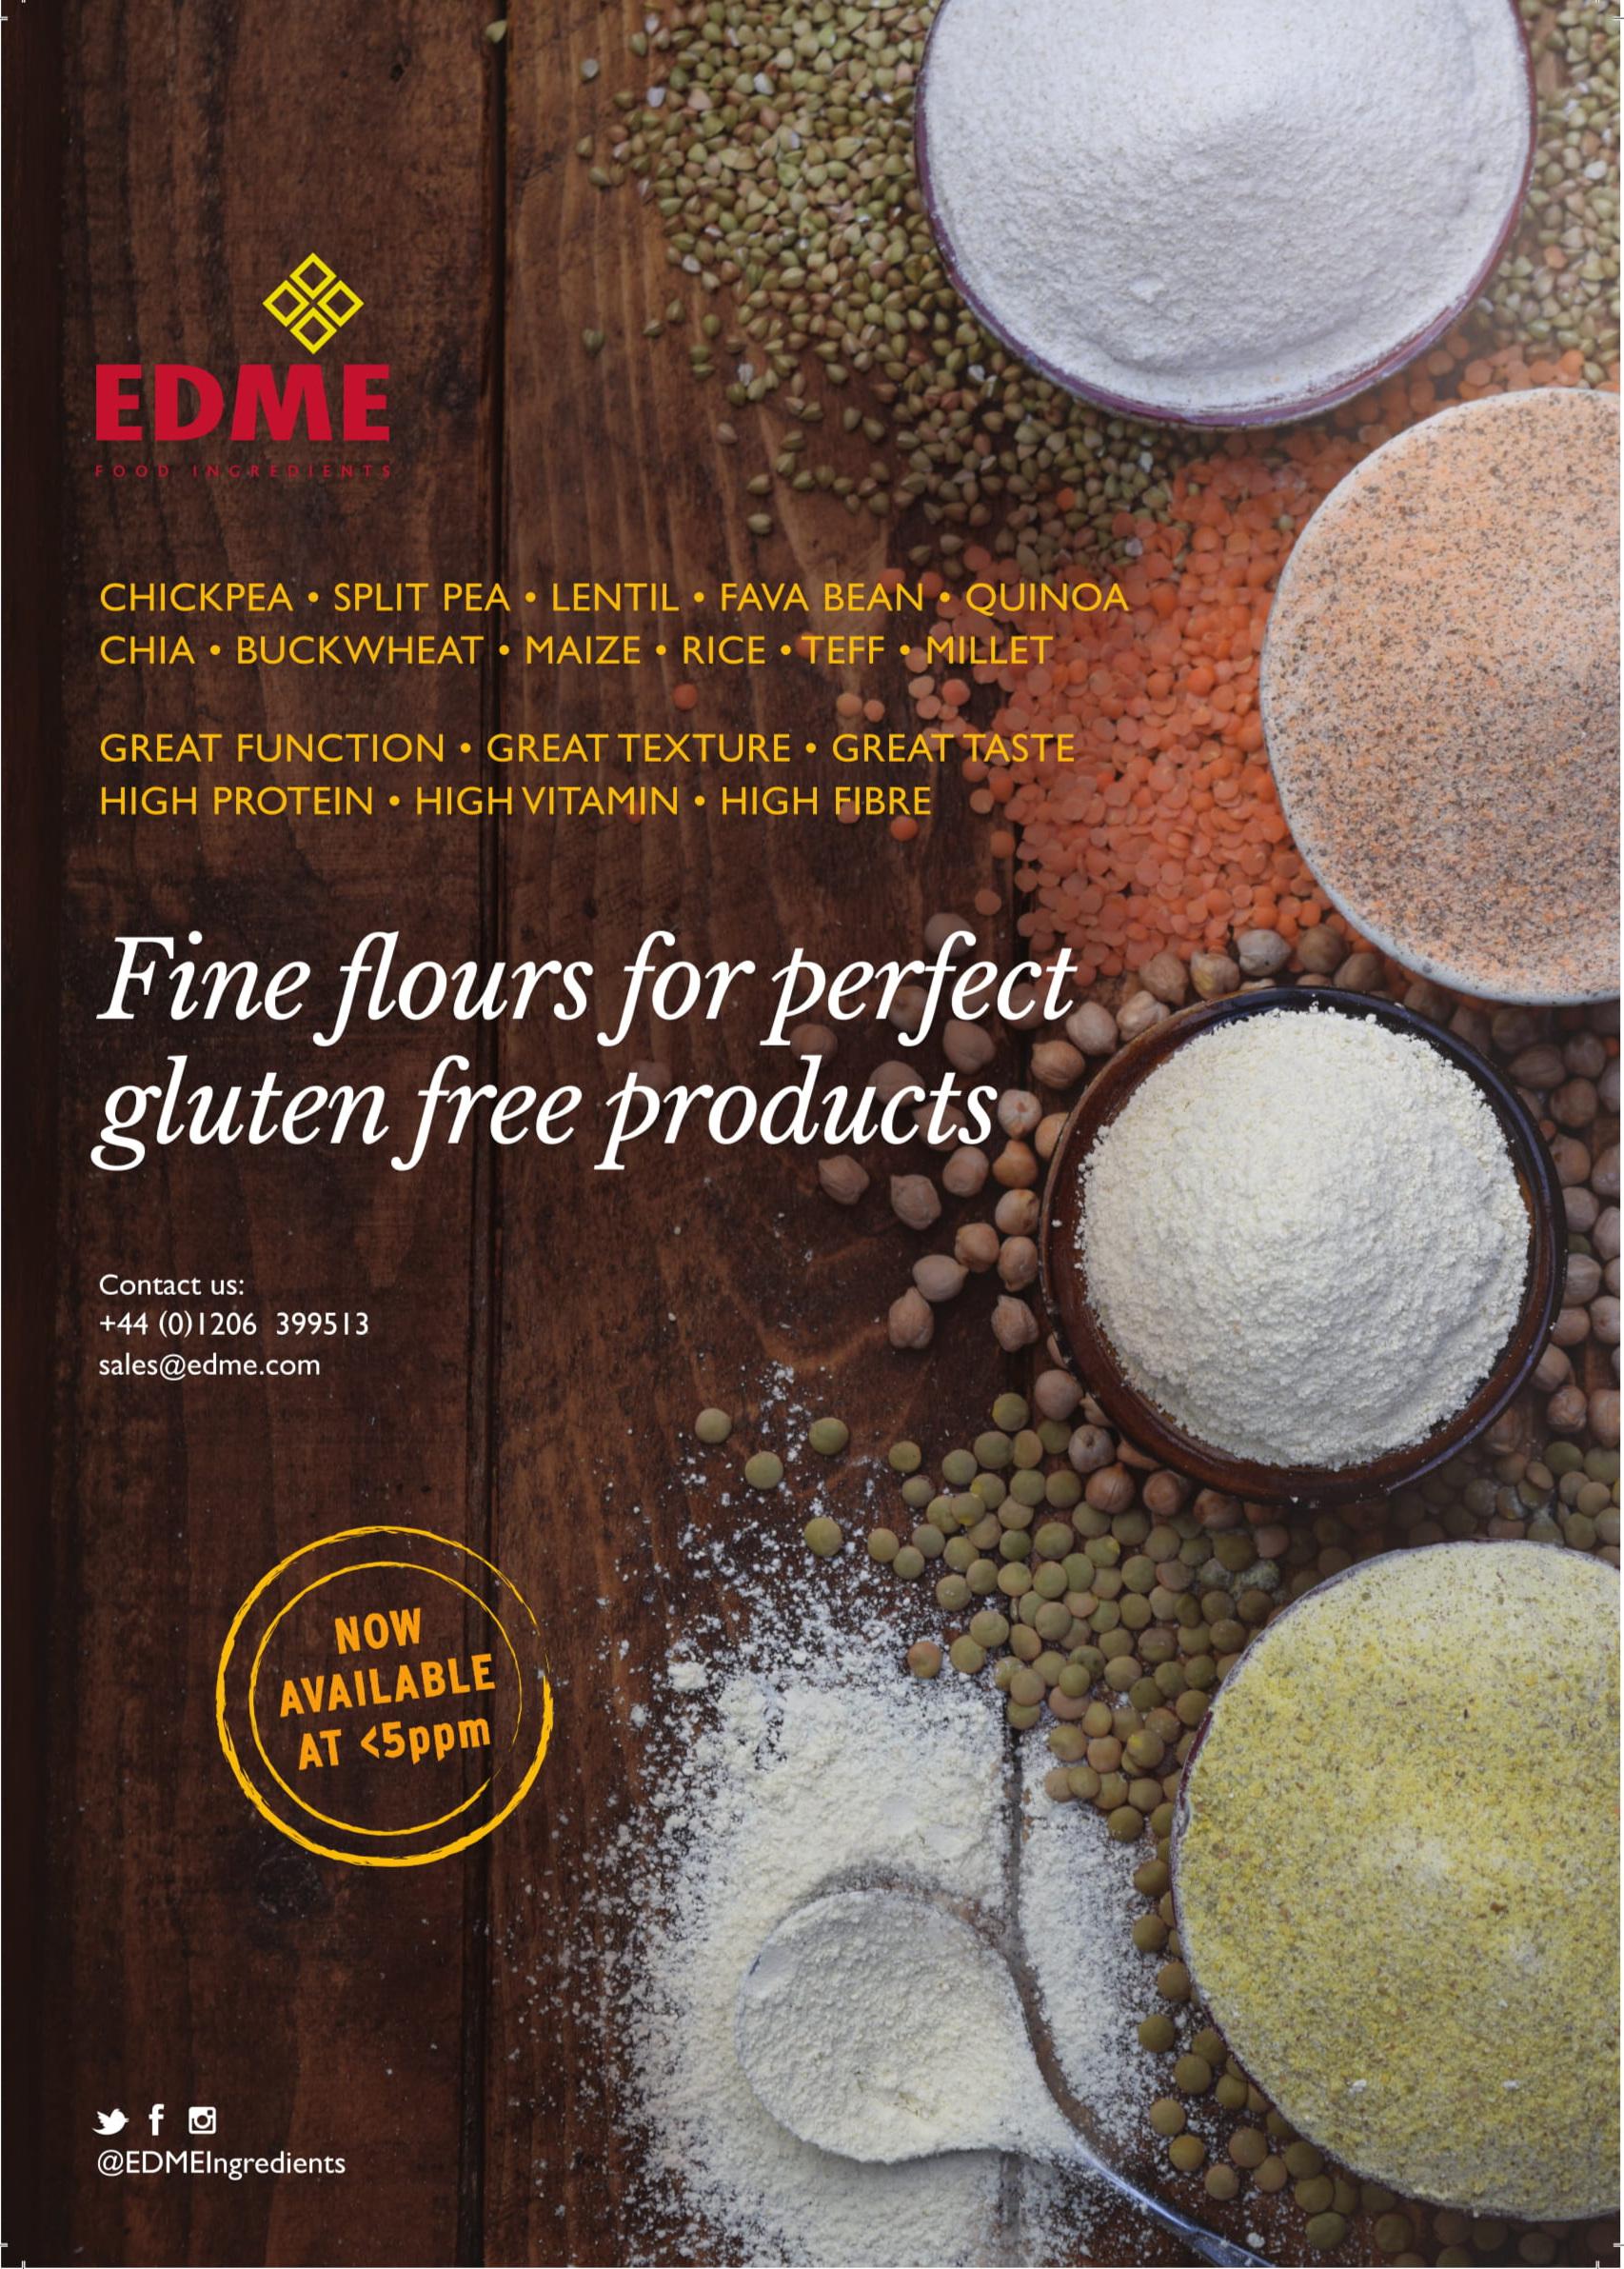 EDME+Gluten+free+ad+%28final+for+print%29-1.jpg